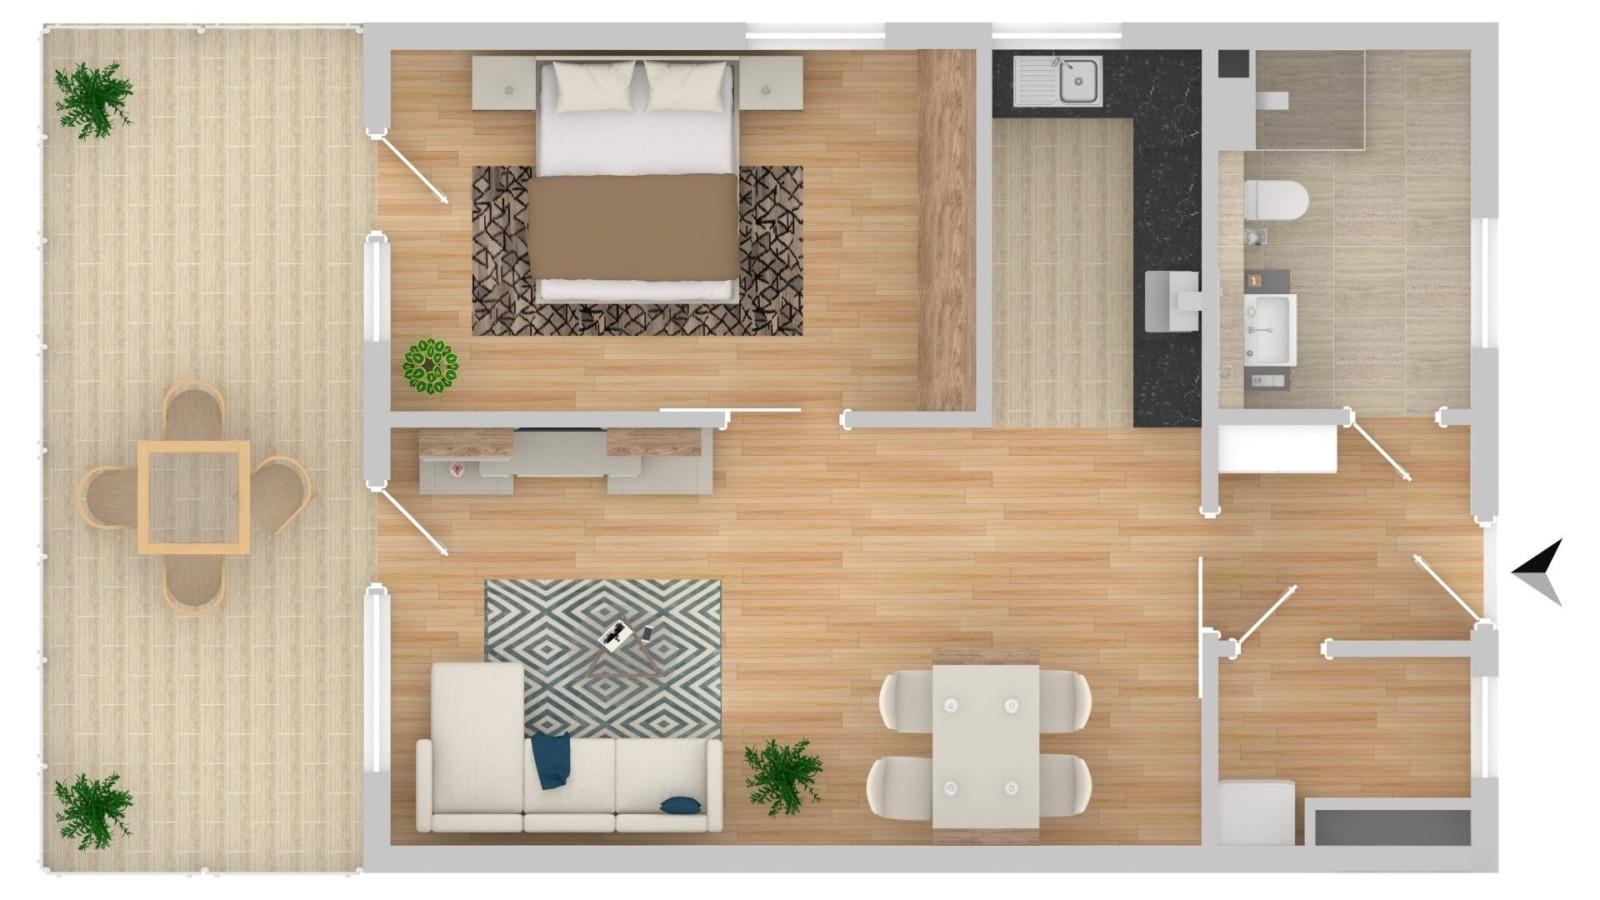 wohnung mieten deggendorf pater fink str erl immobiliengruppe. Black Bedroom Furniture Sets. Home Design Ideas